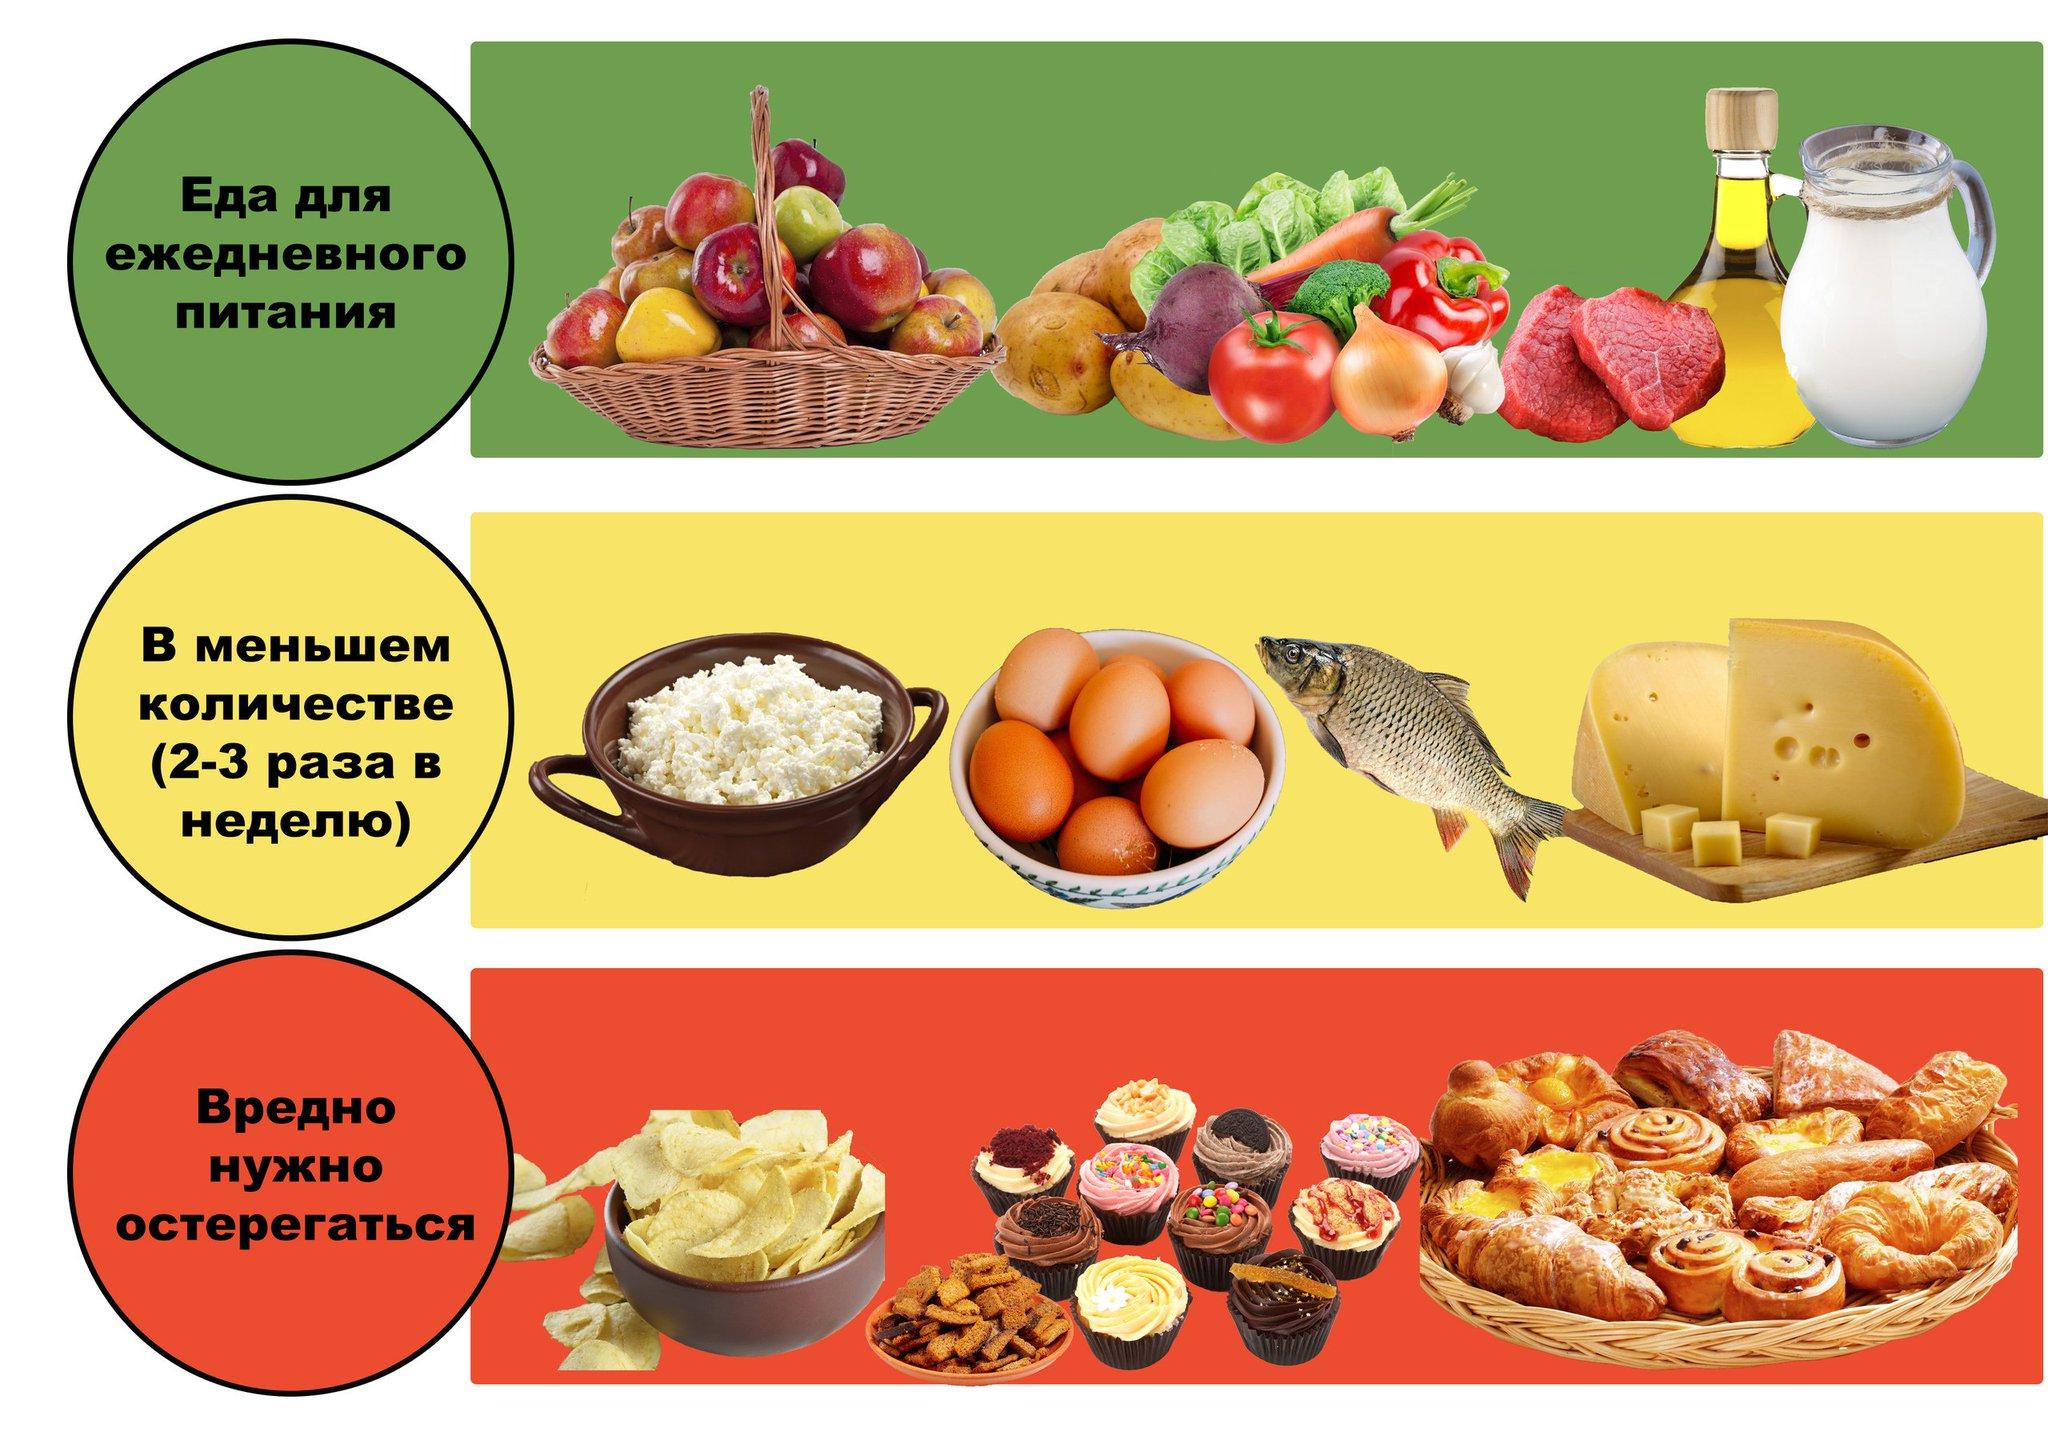 Правило Светофора Диета. Диета Светофор: меню для похудения